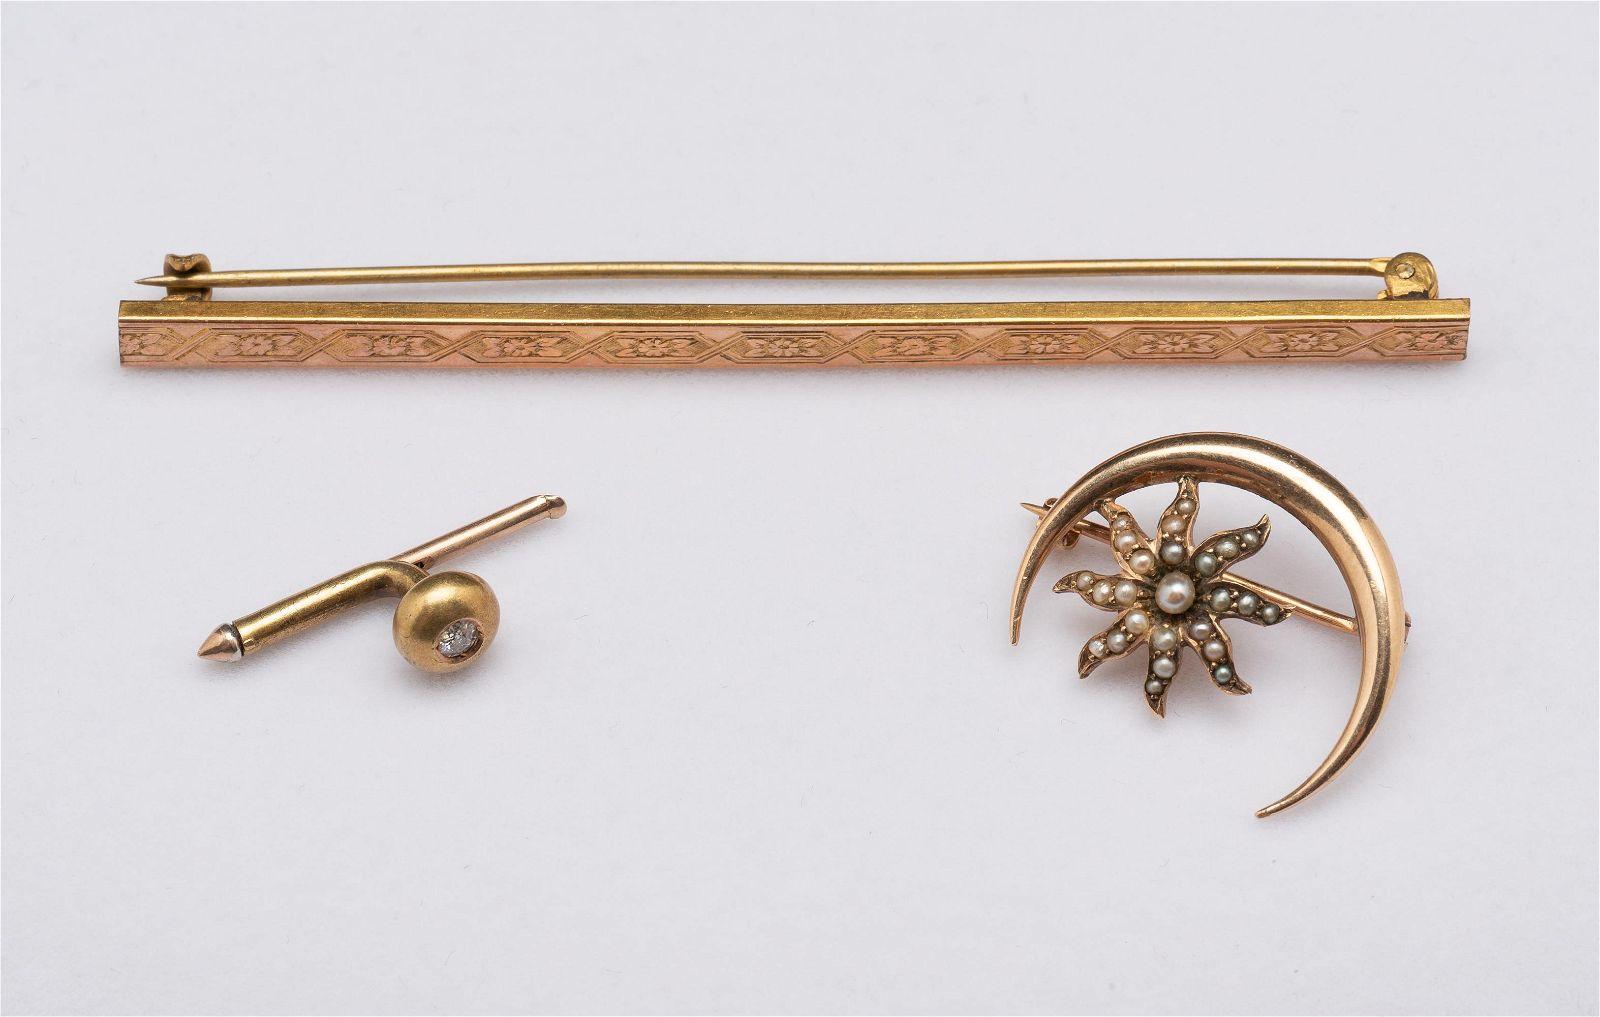 3 Pcs Vintage Gold Jewelry